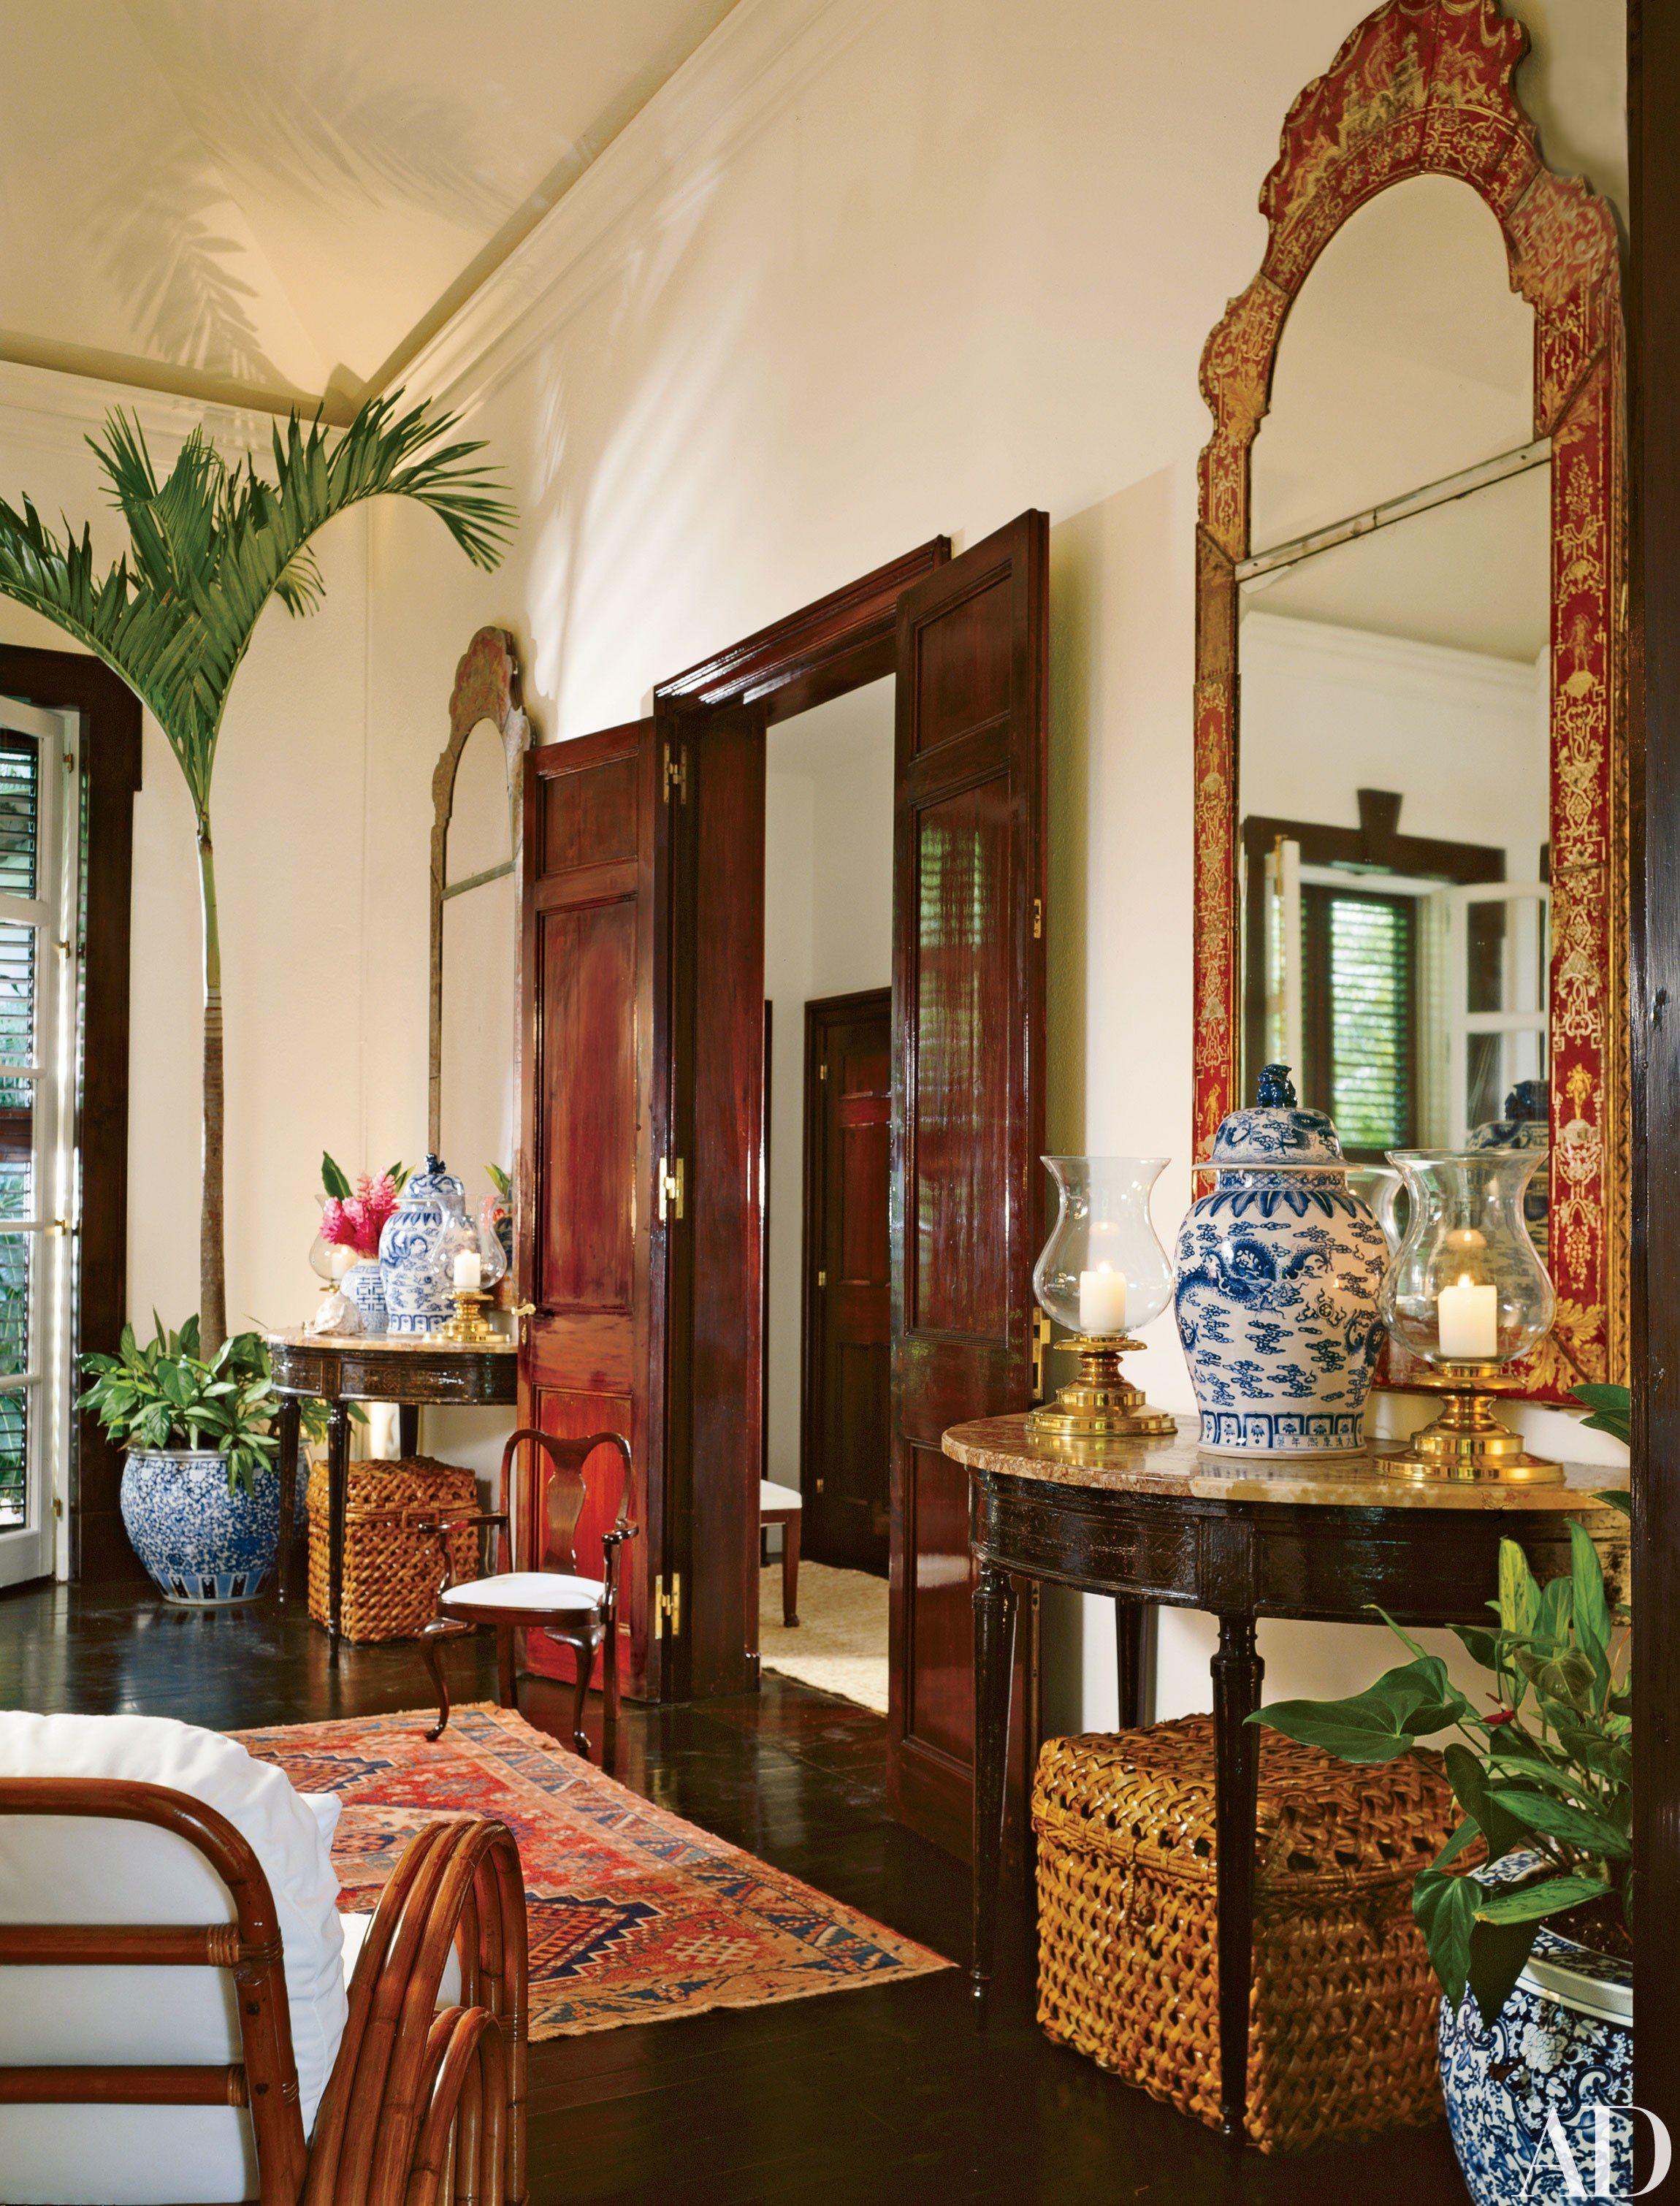 Take a Look Inside Ralph Laurenu0027s Two House